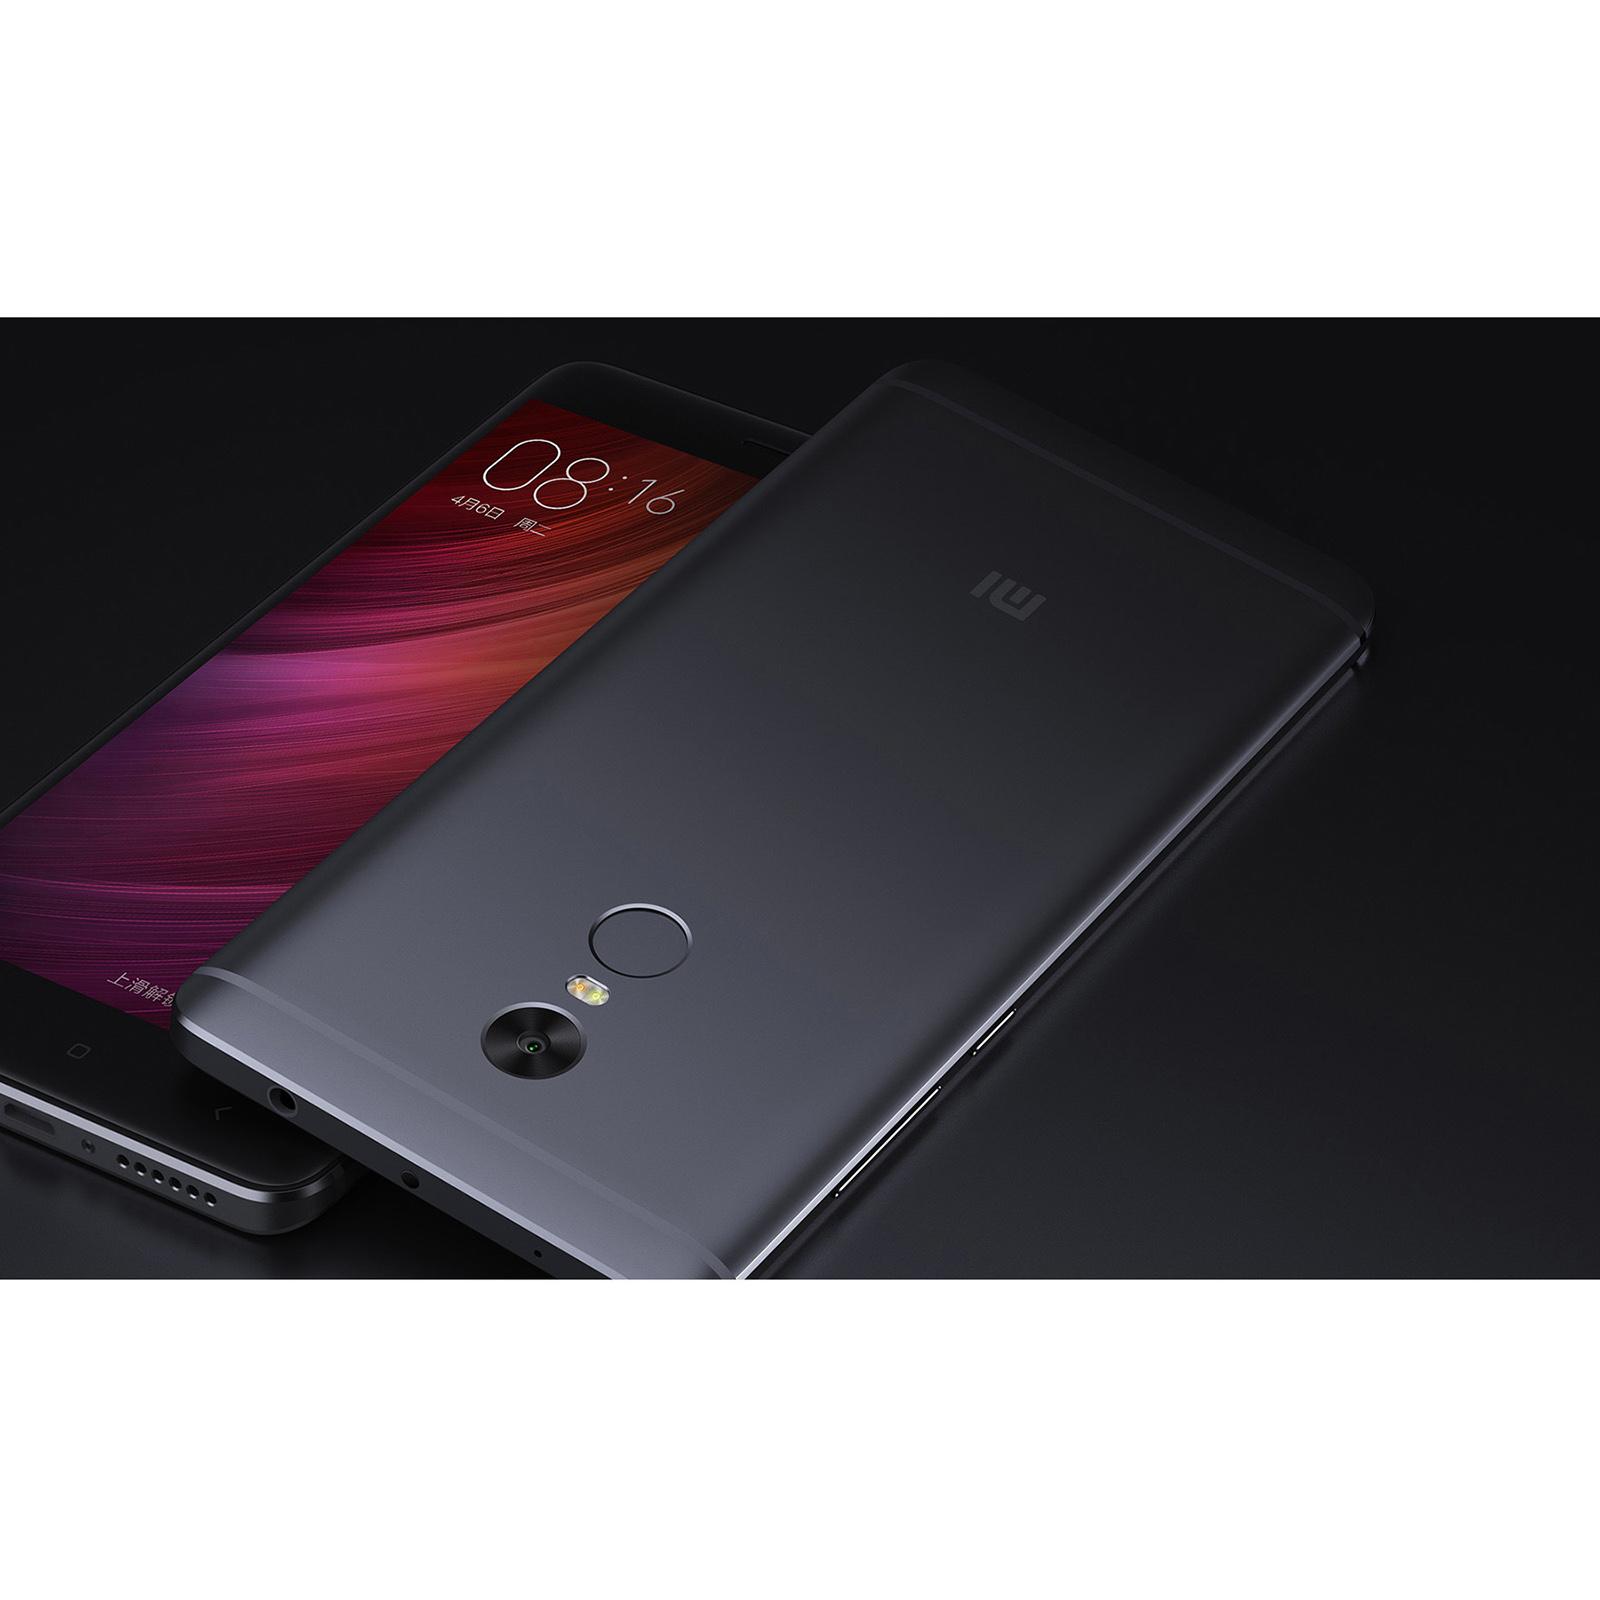 Xiaomi Redmi Note 4 3 32 Smartphone Eu Wayteq Europe